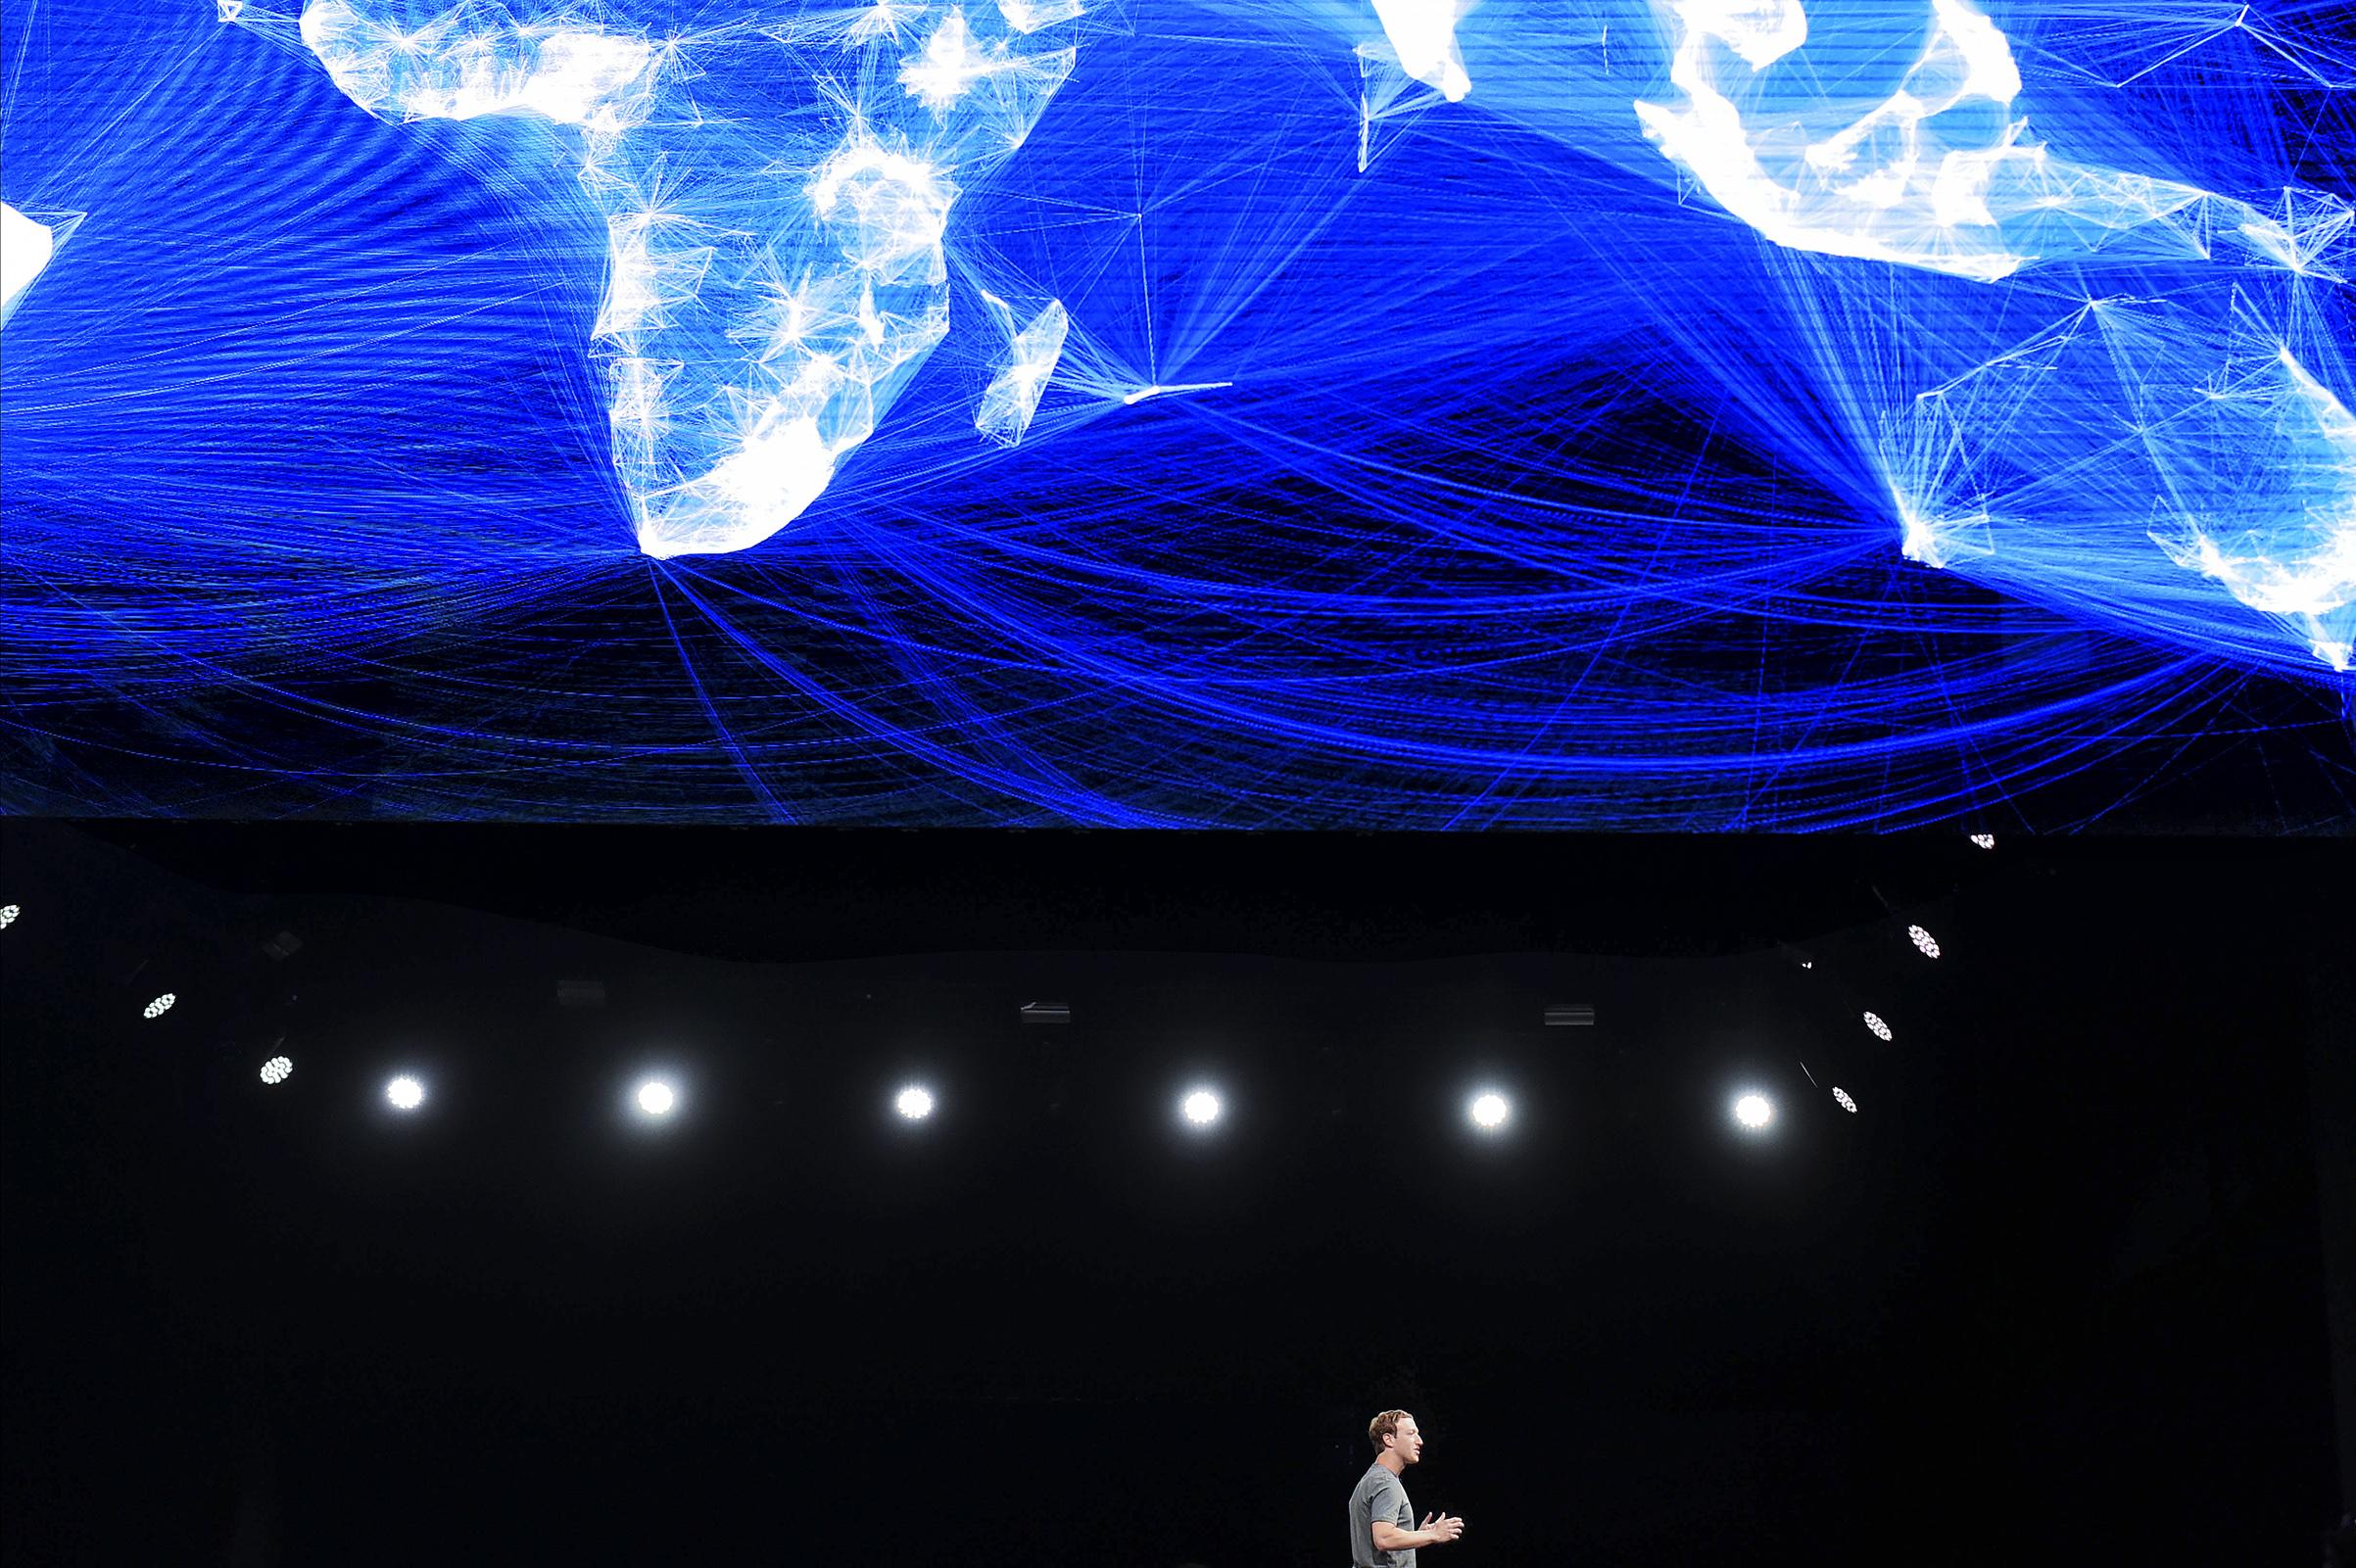 Facebook founder and CEO Mark Zuckerberg speaks during a presentation on Feb.21, 2016, inBarcelona